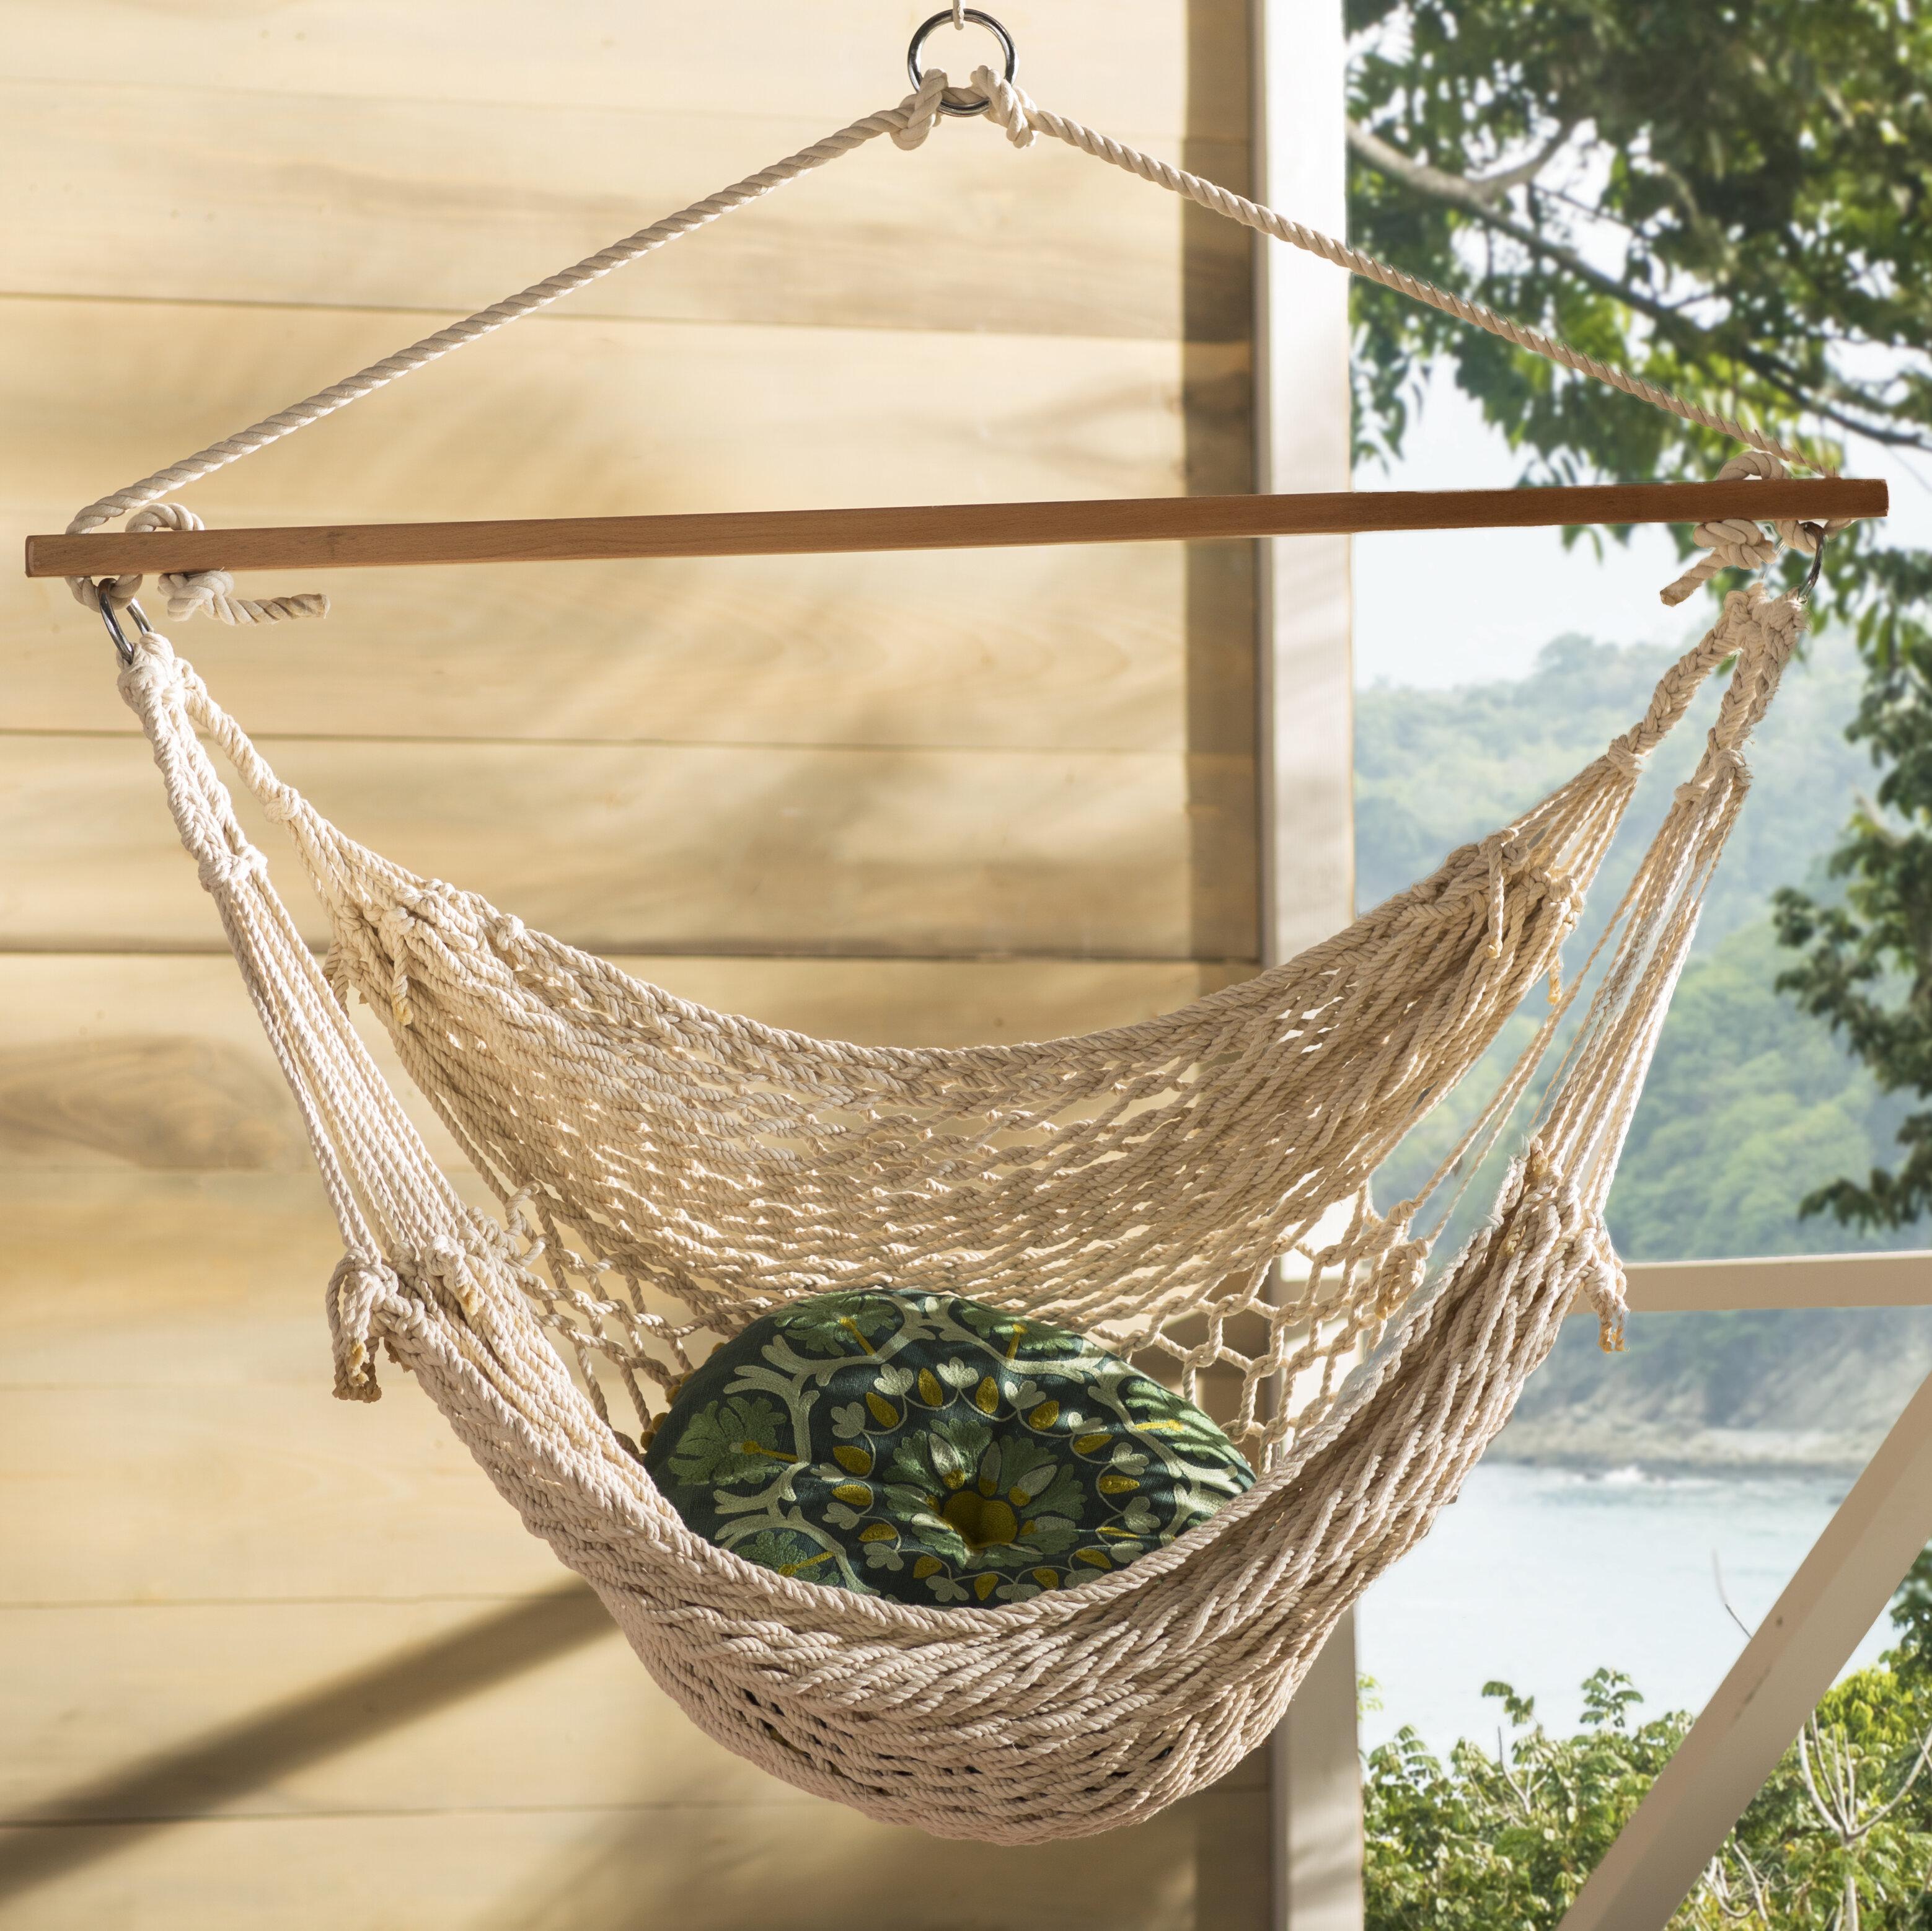 Caribbean Patio Hammock Chair Woven Rope w 44 in Spreader Bar Backyard Tree Hang